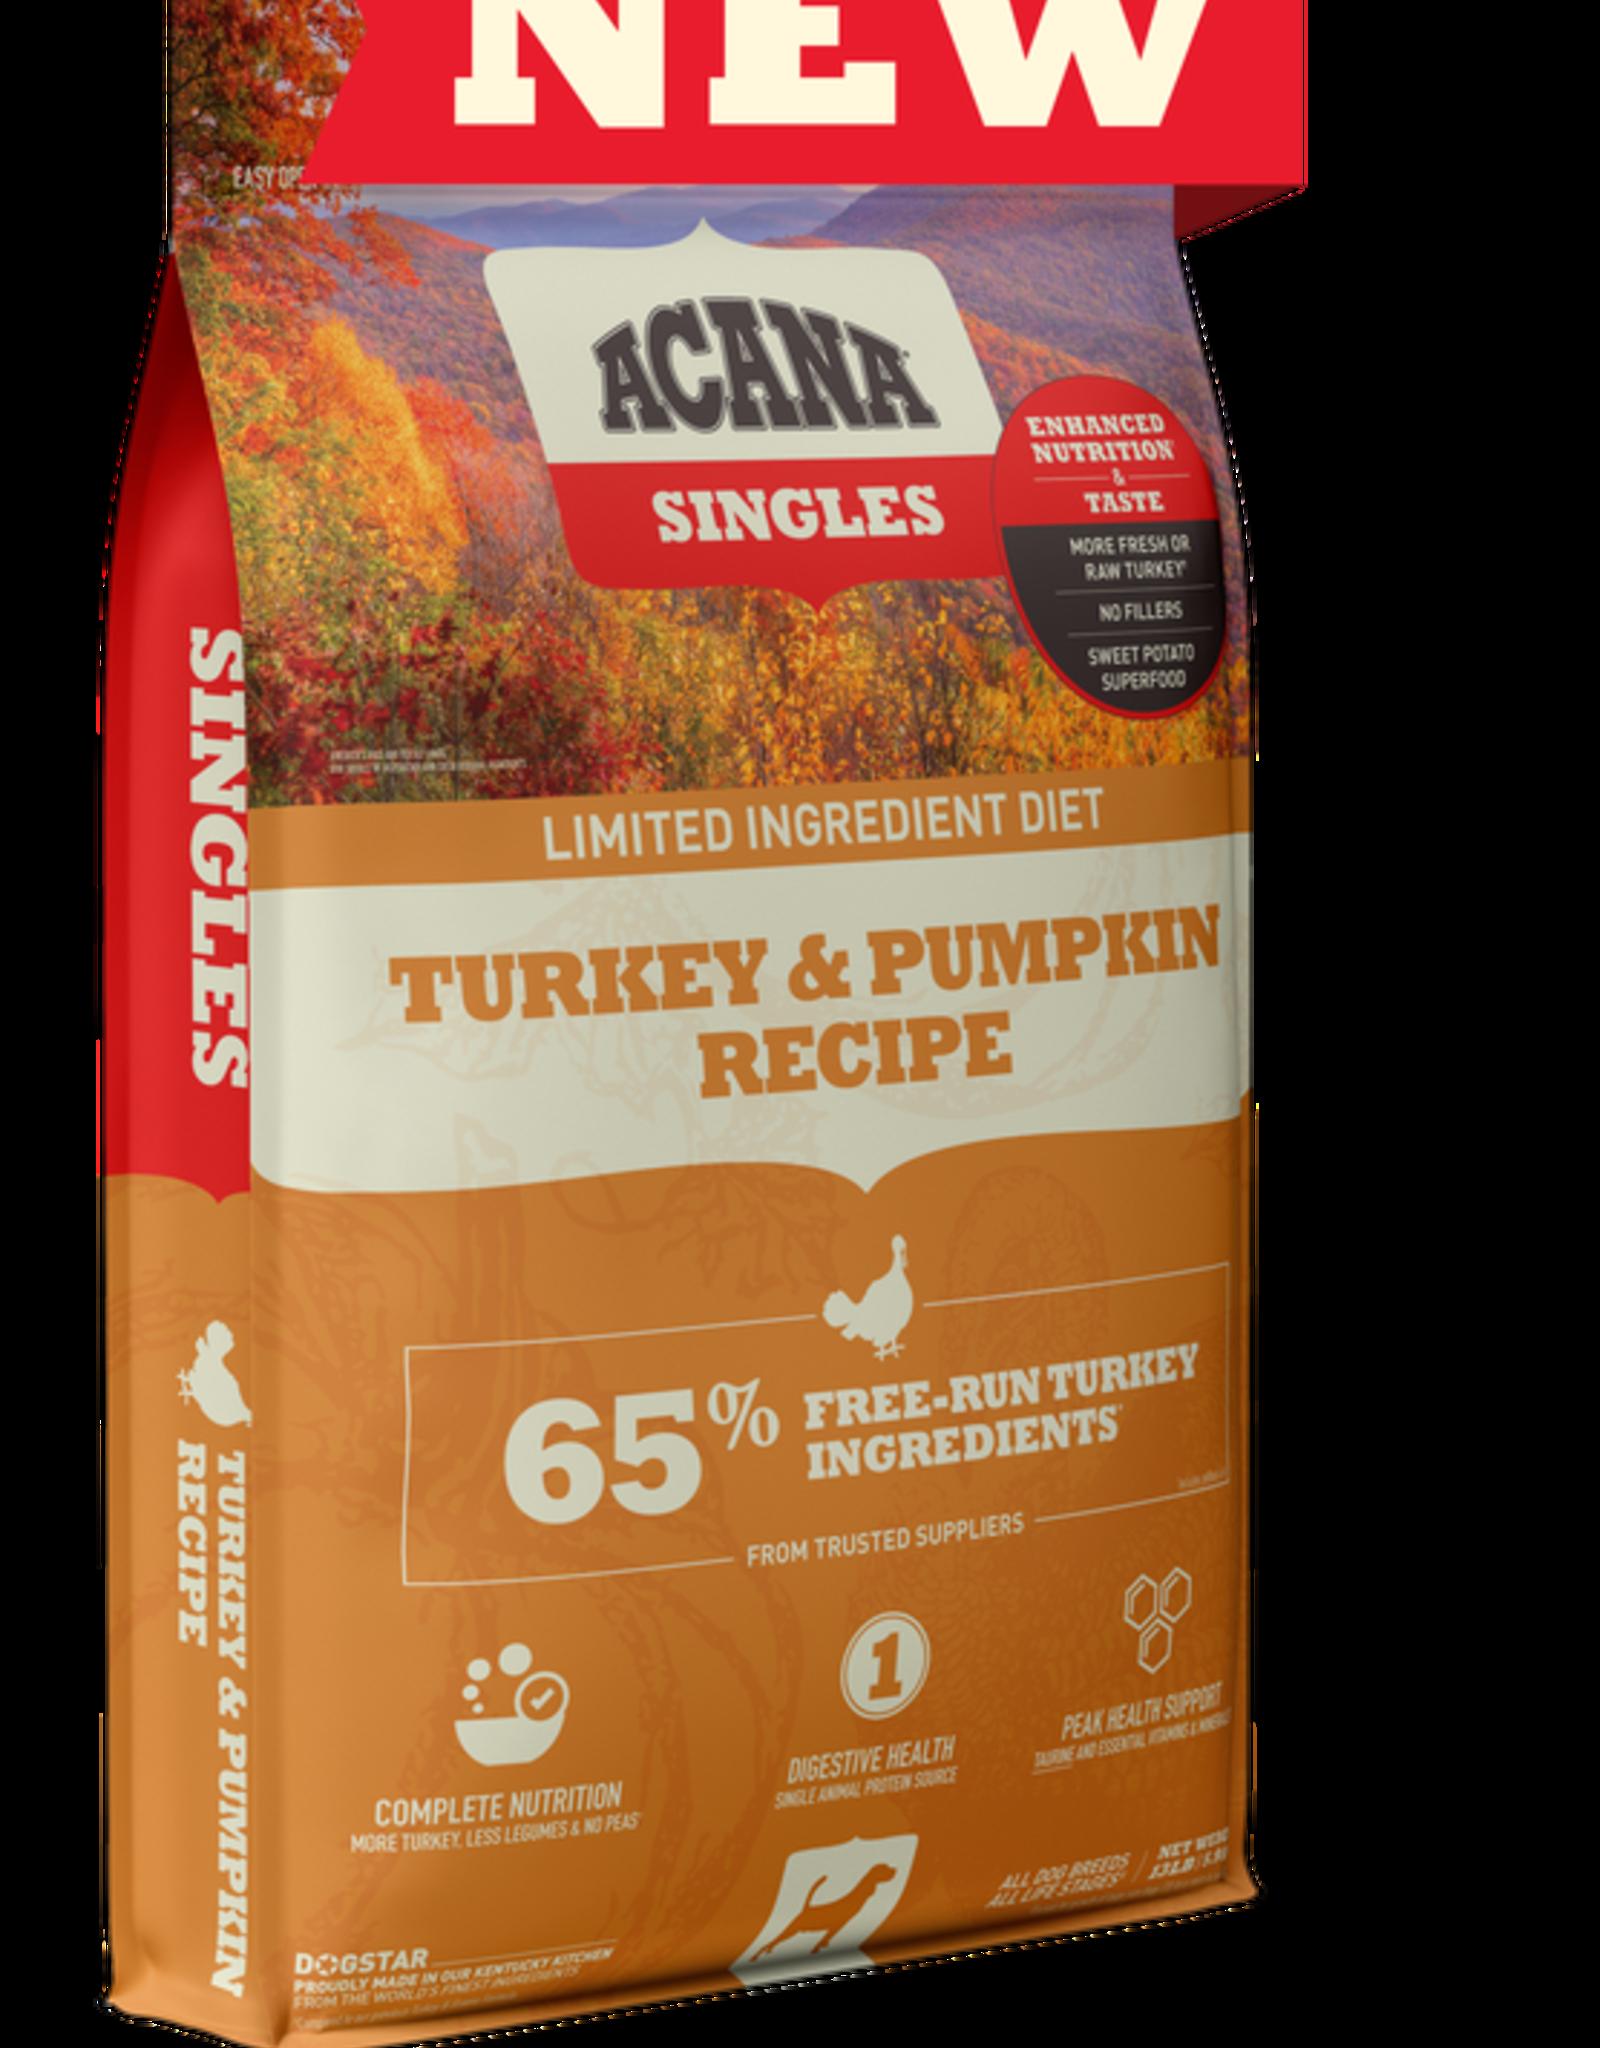 Acana Dog Singles Turkey & Pumpkin - Grain-Free 13lb